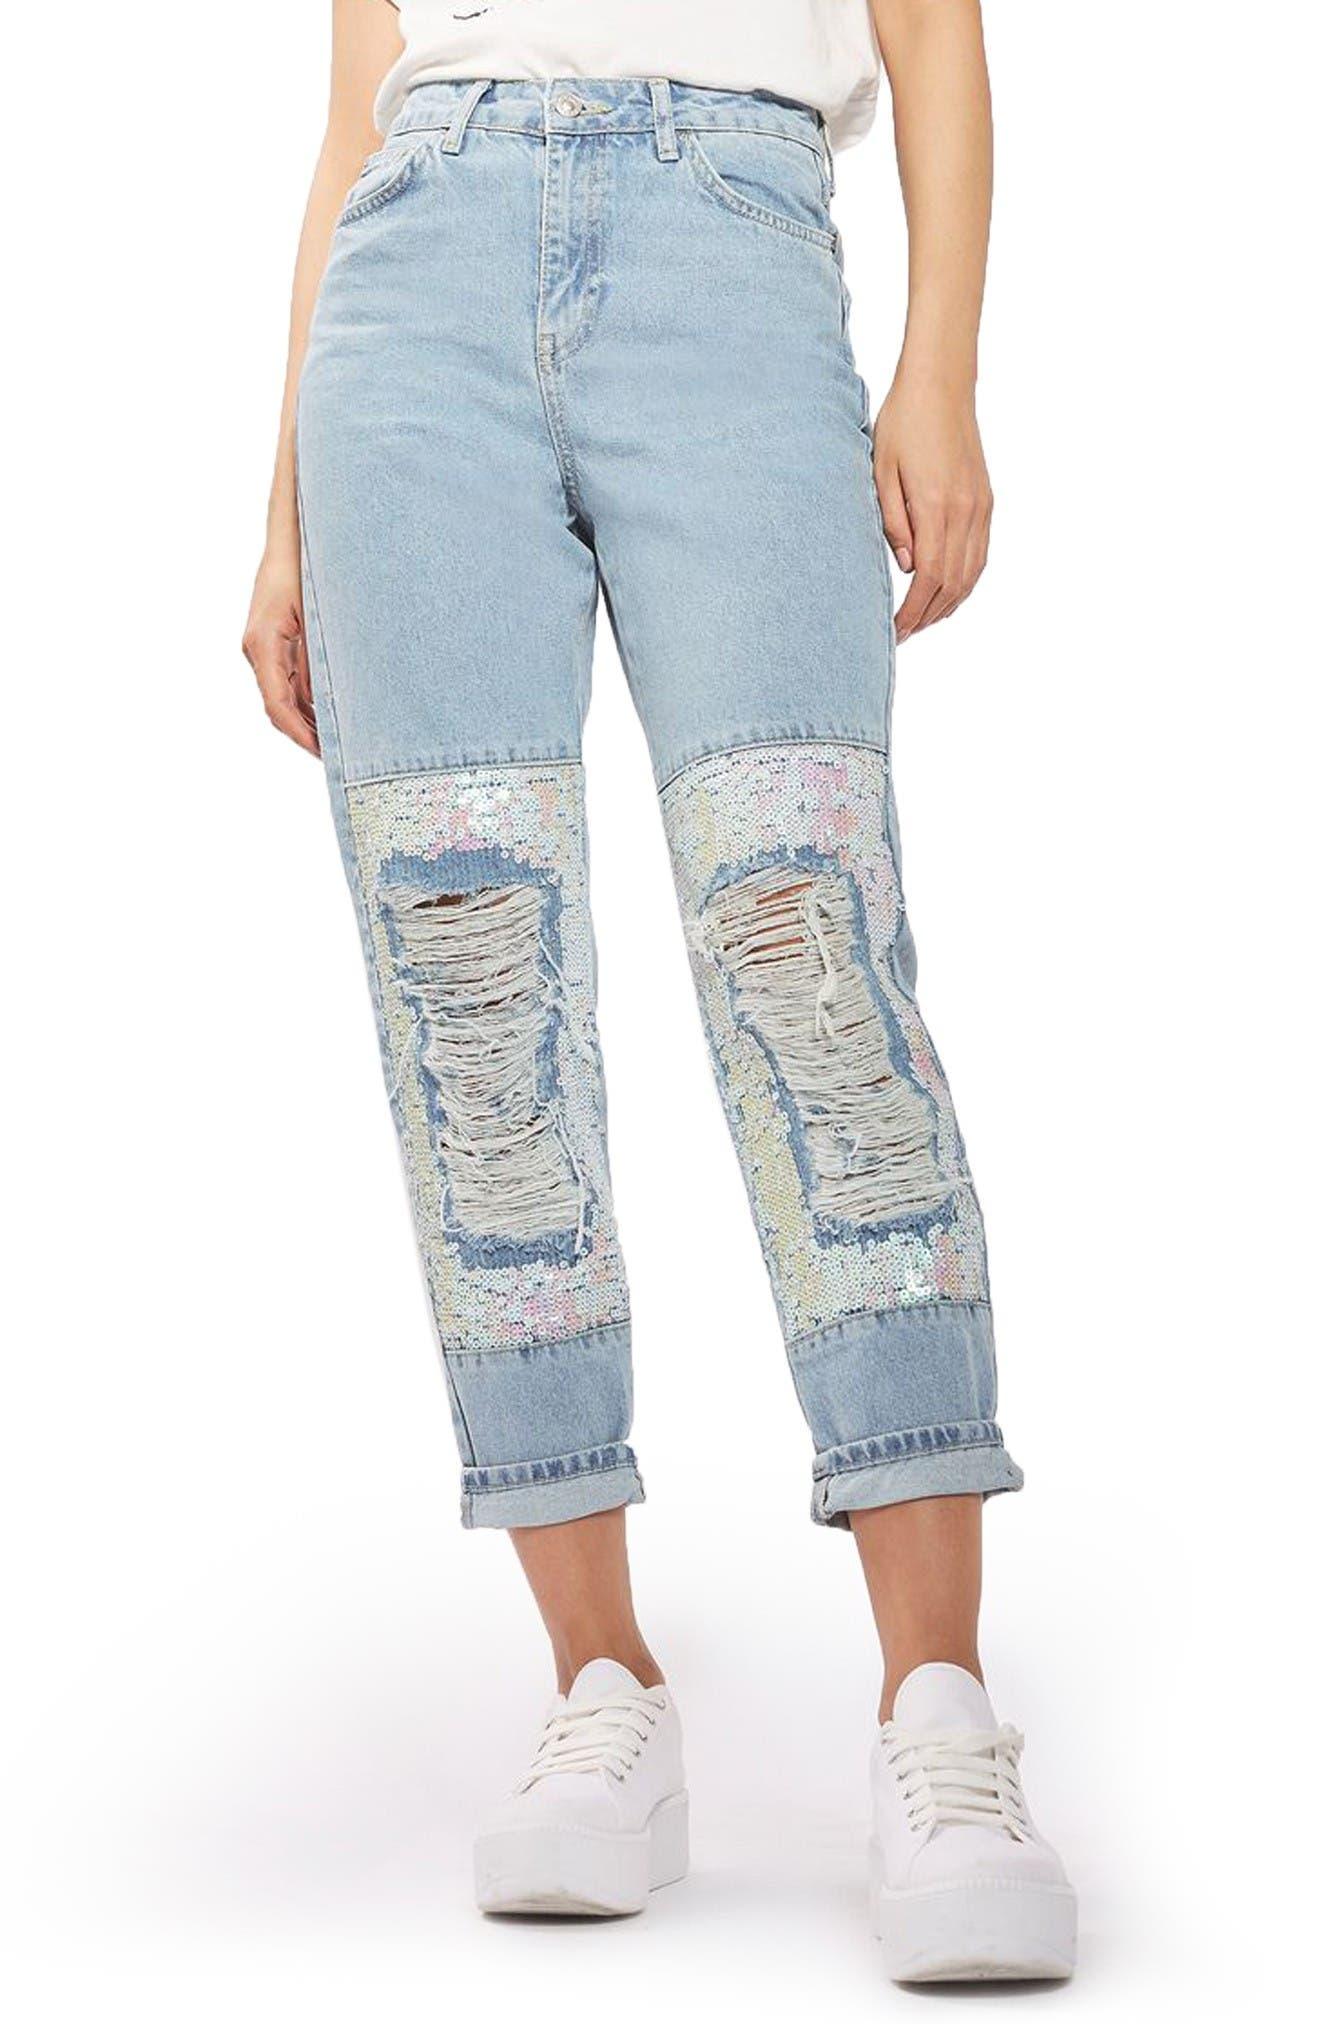 Main Image - Topshop Ripped Sequin Knee Mom Jeans (Regular & Petite)